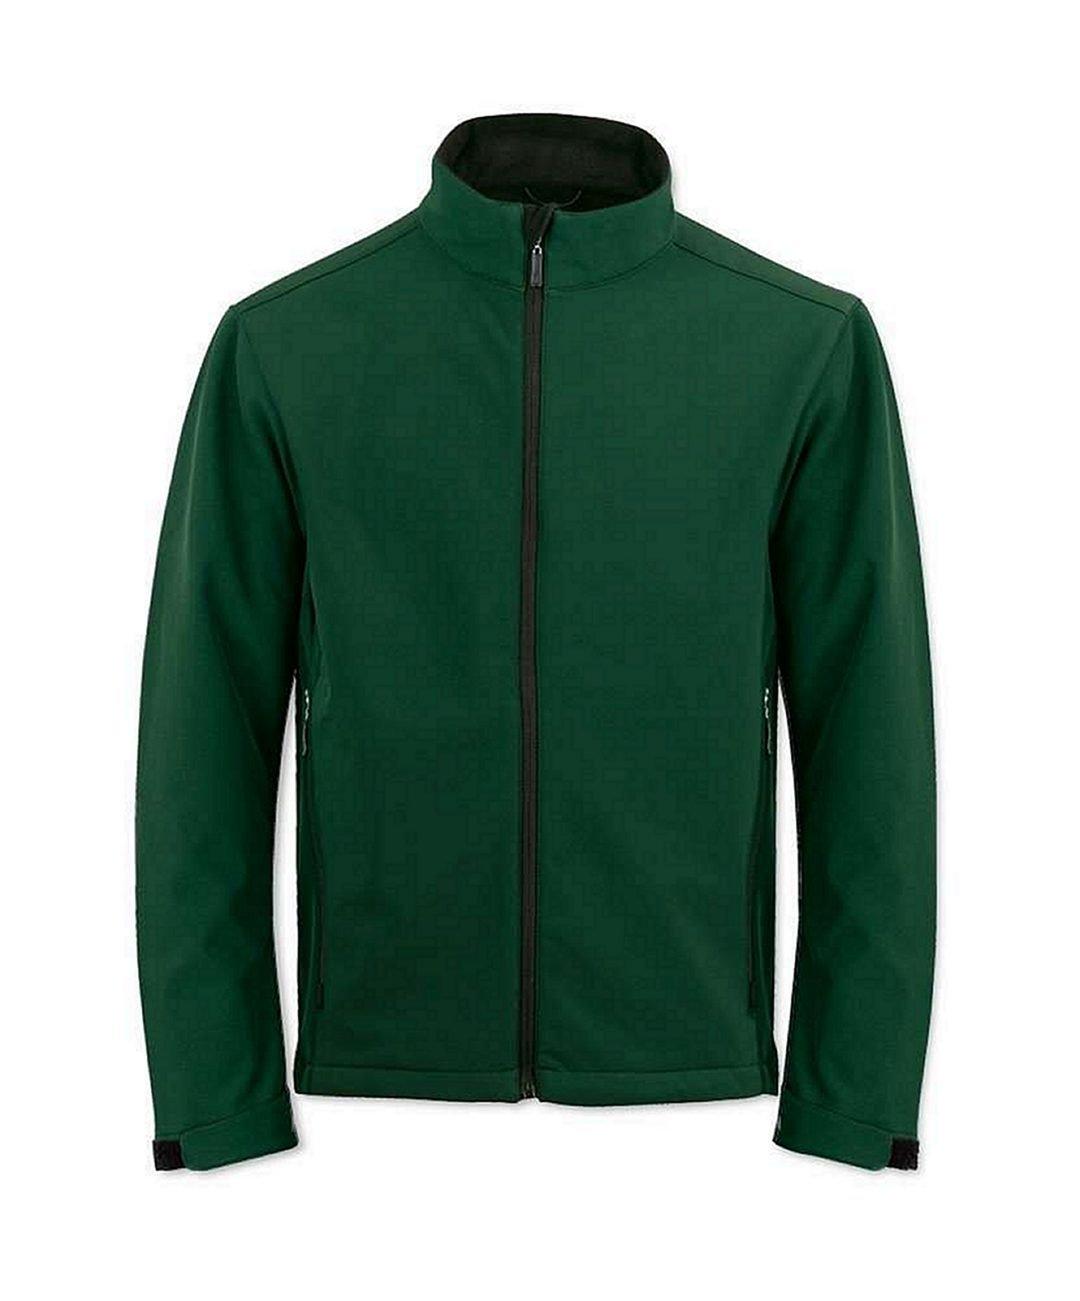 Soft Shell Jacket, Green